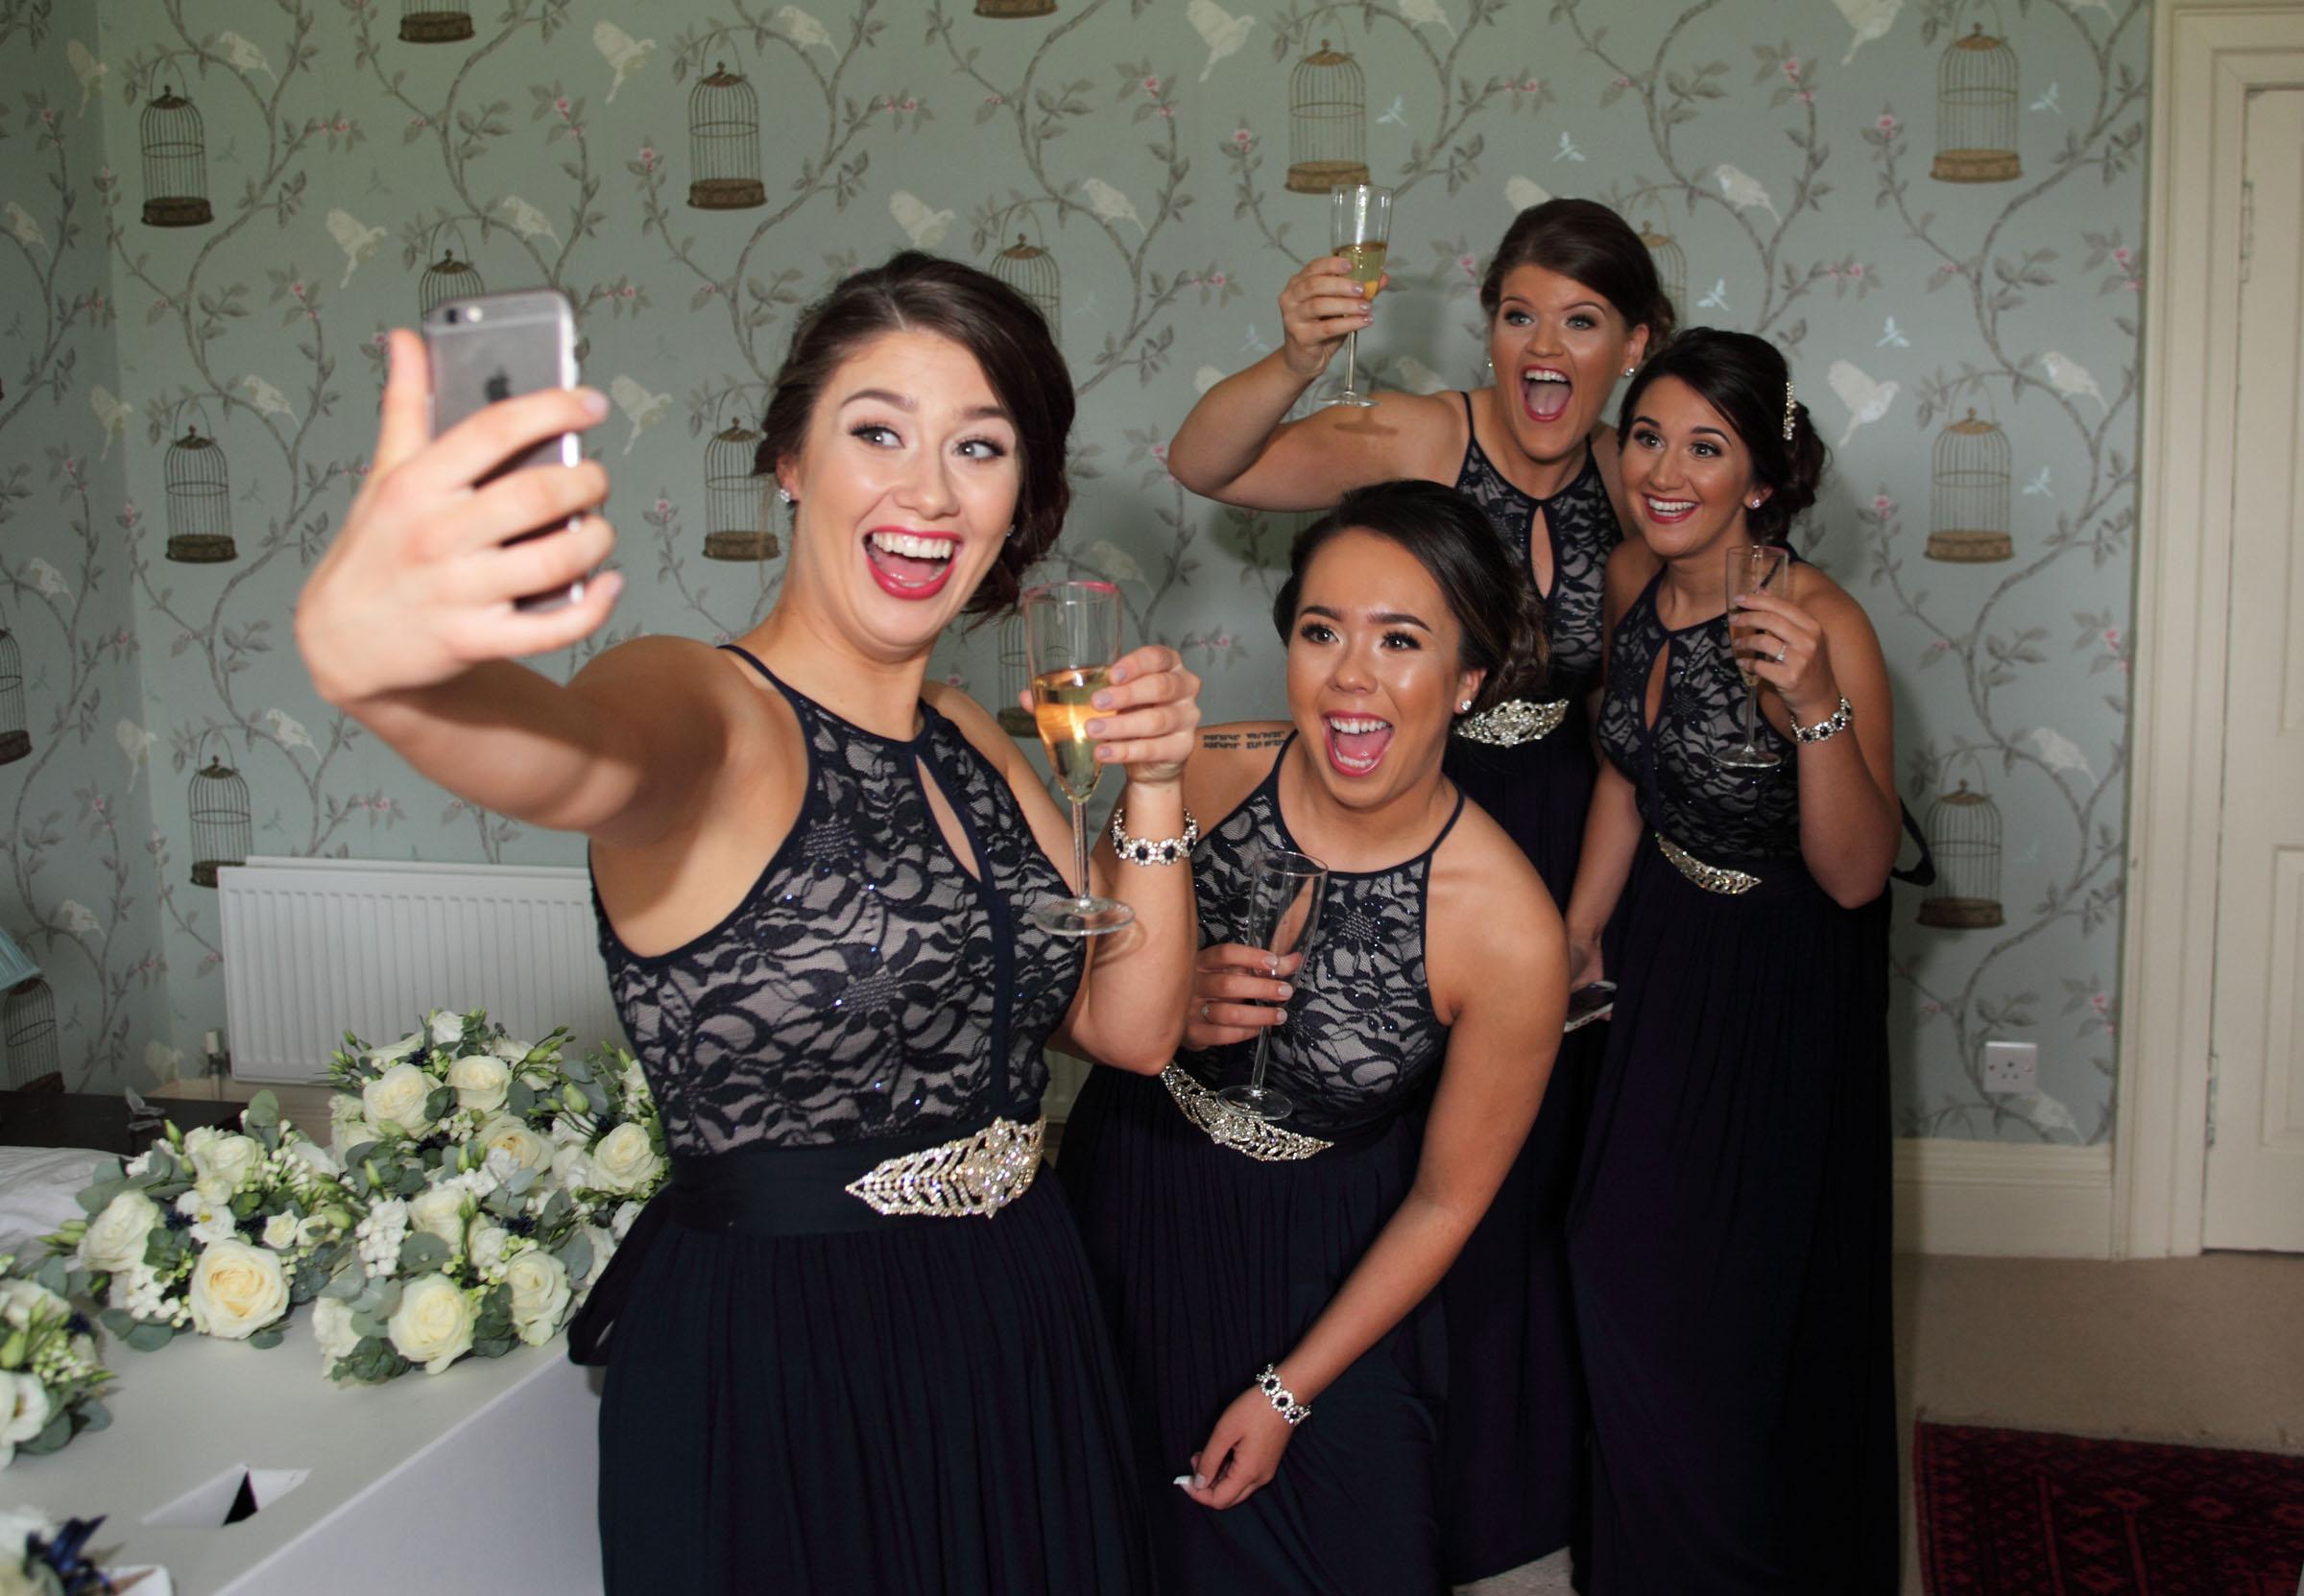 Bridesmaids_selfie_Edinburgh wedding photography.jpg